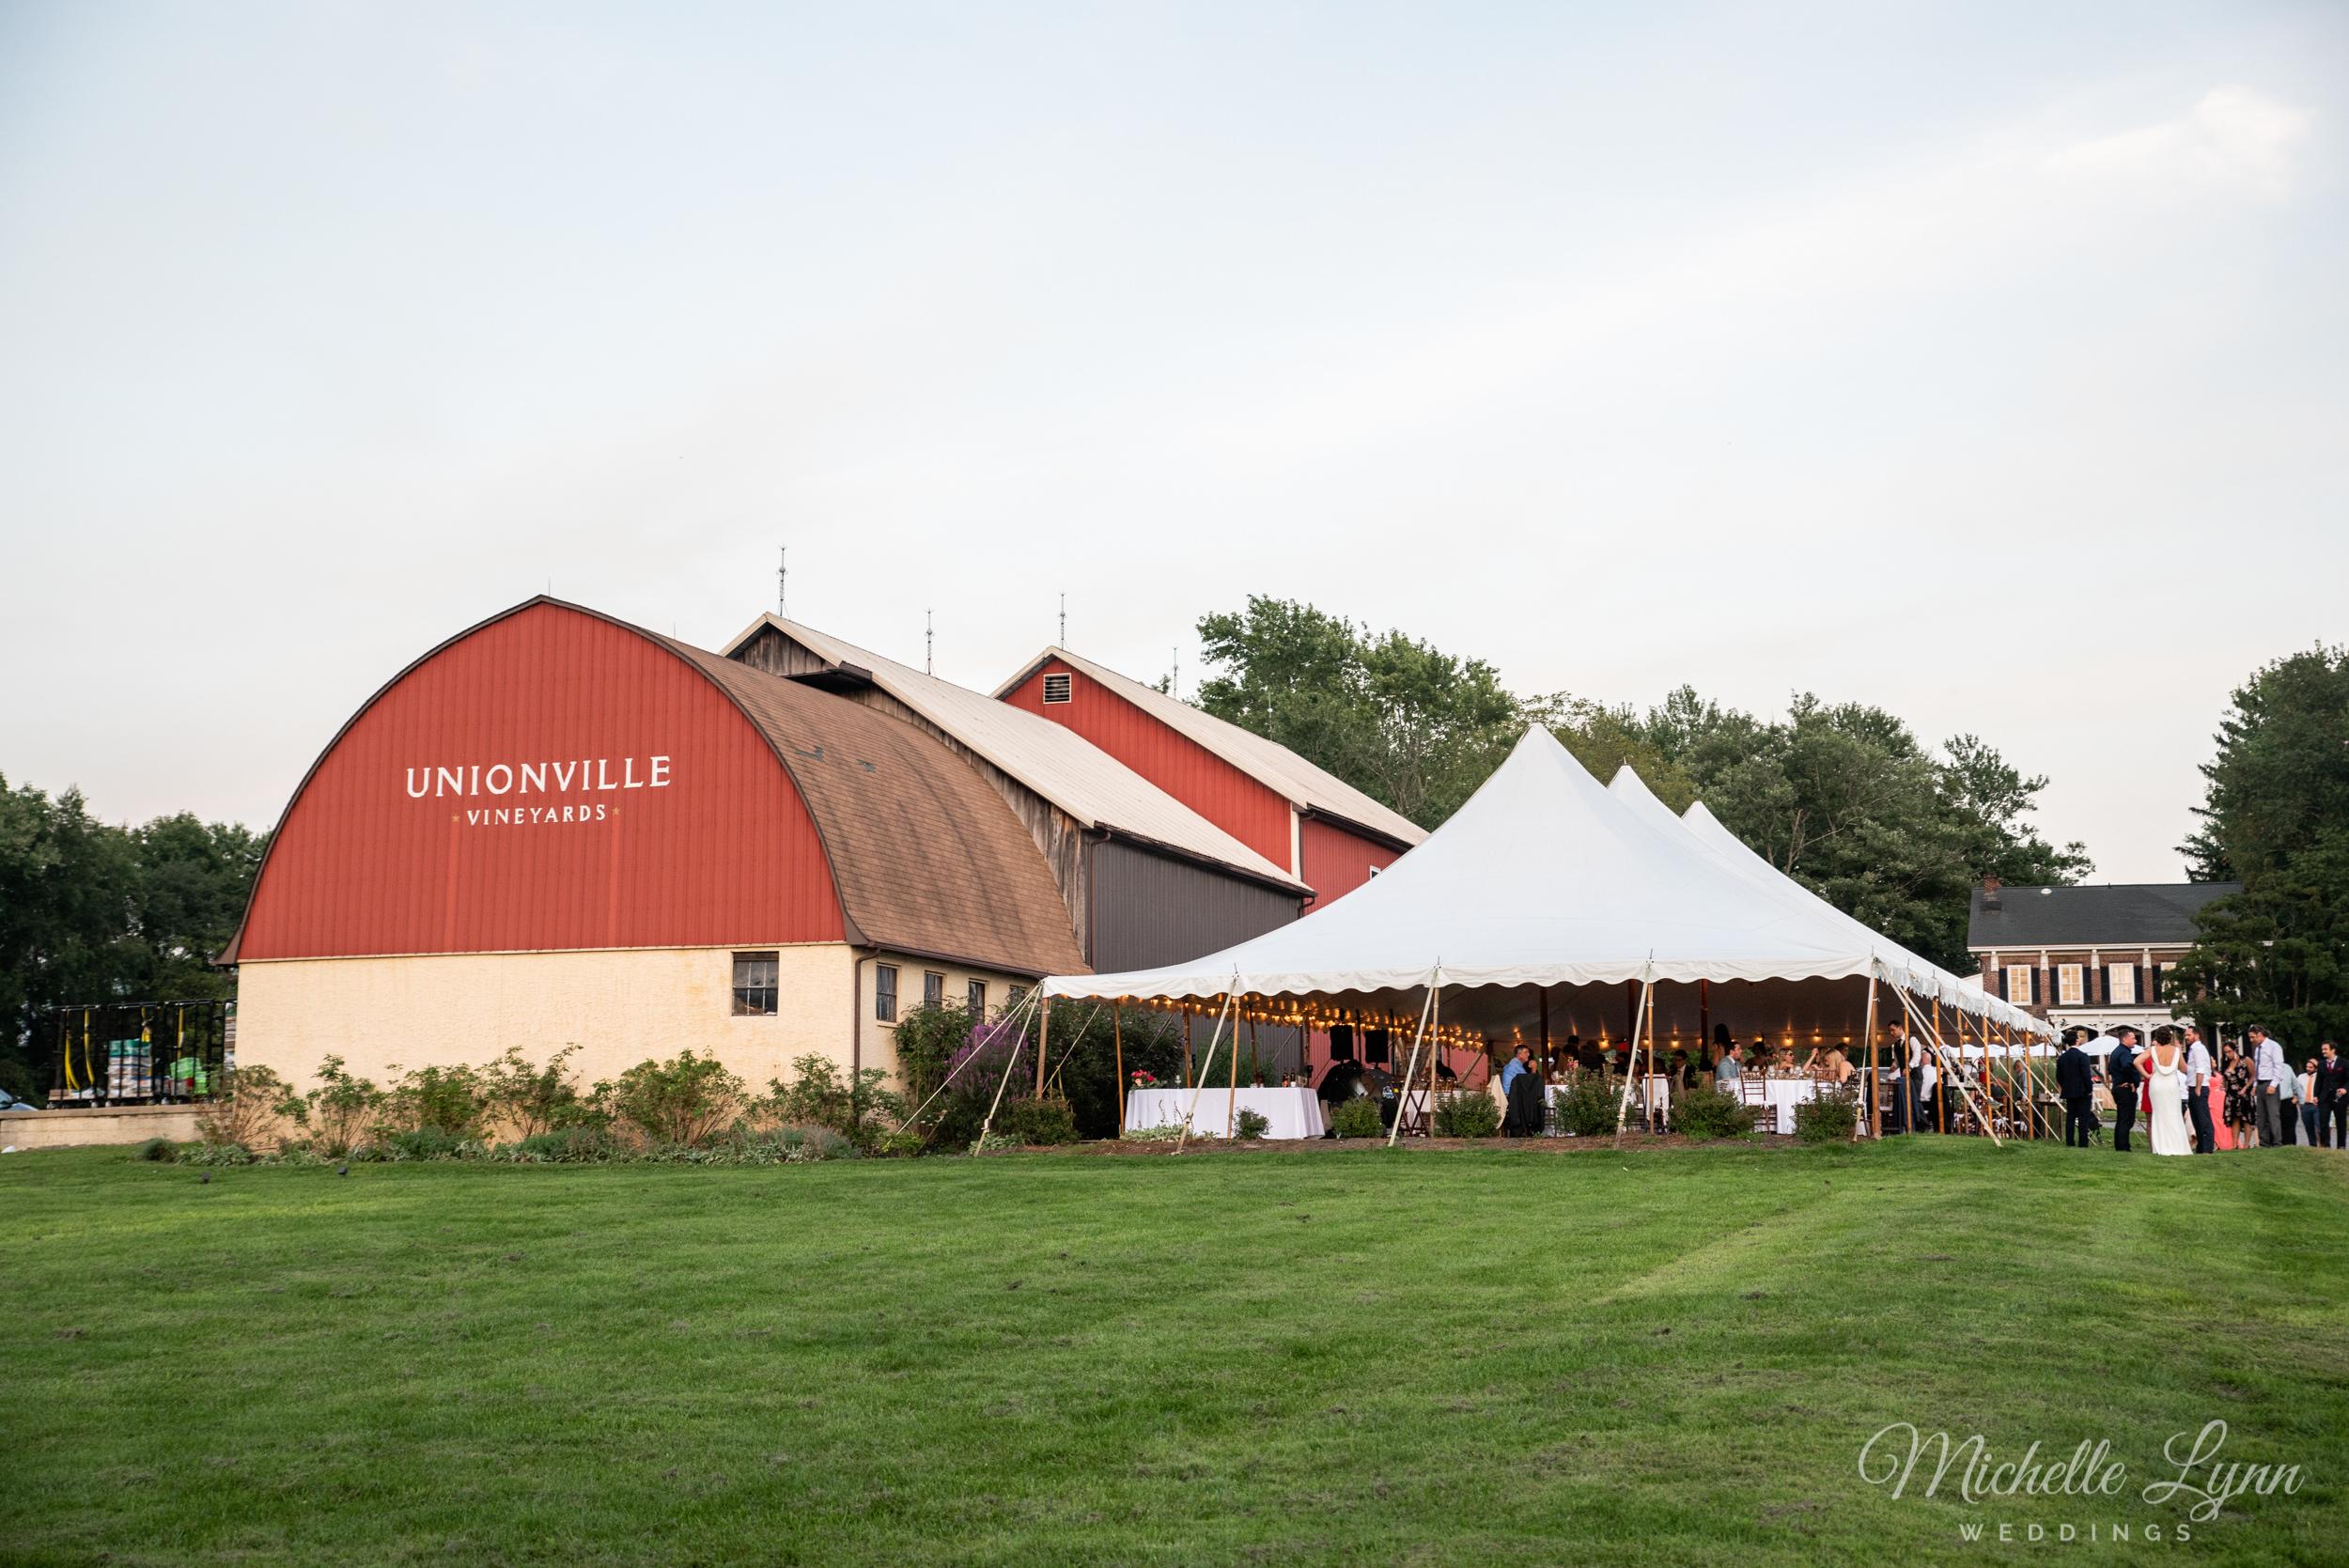 mlw-unionville-vineyards-nj-wedding-photography-69.jpg